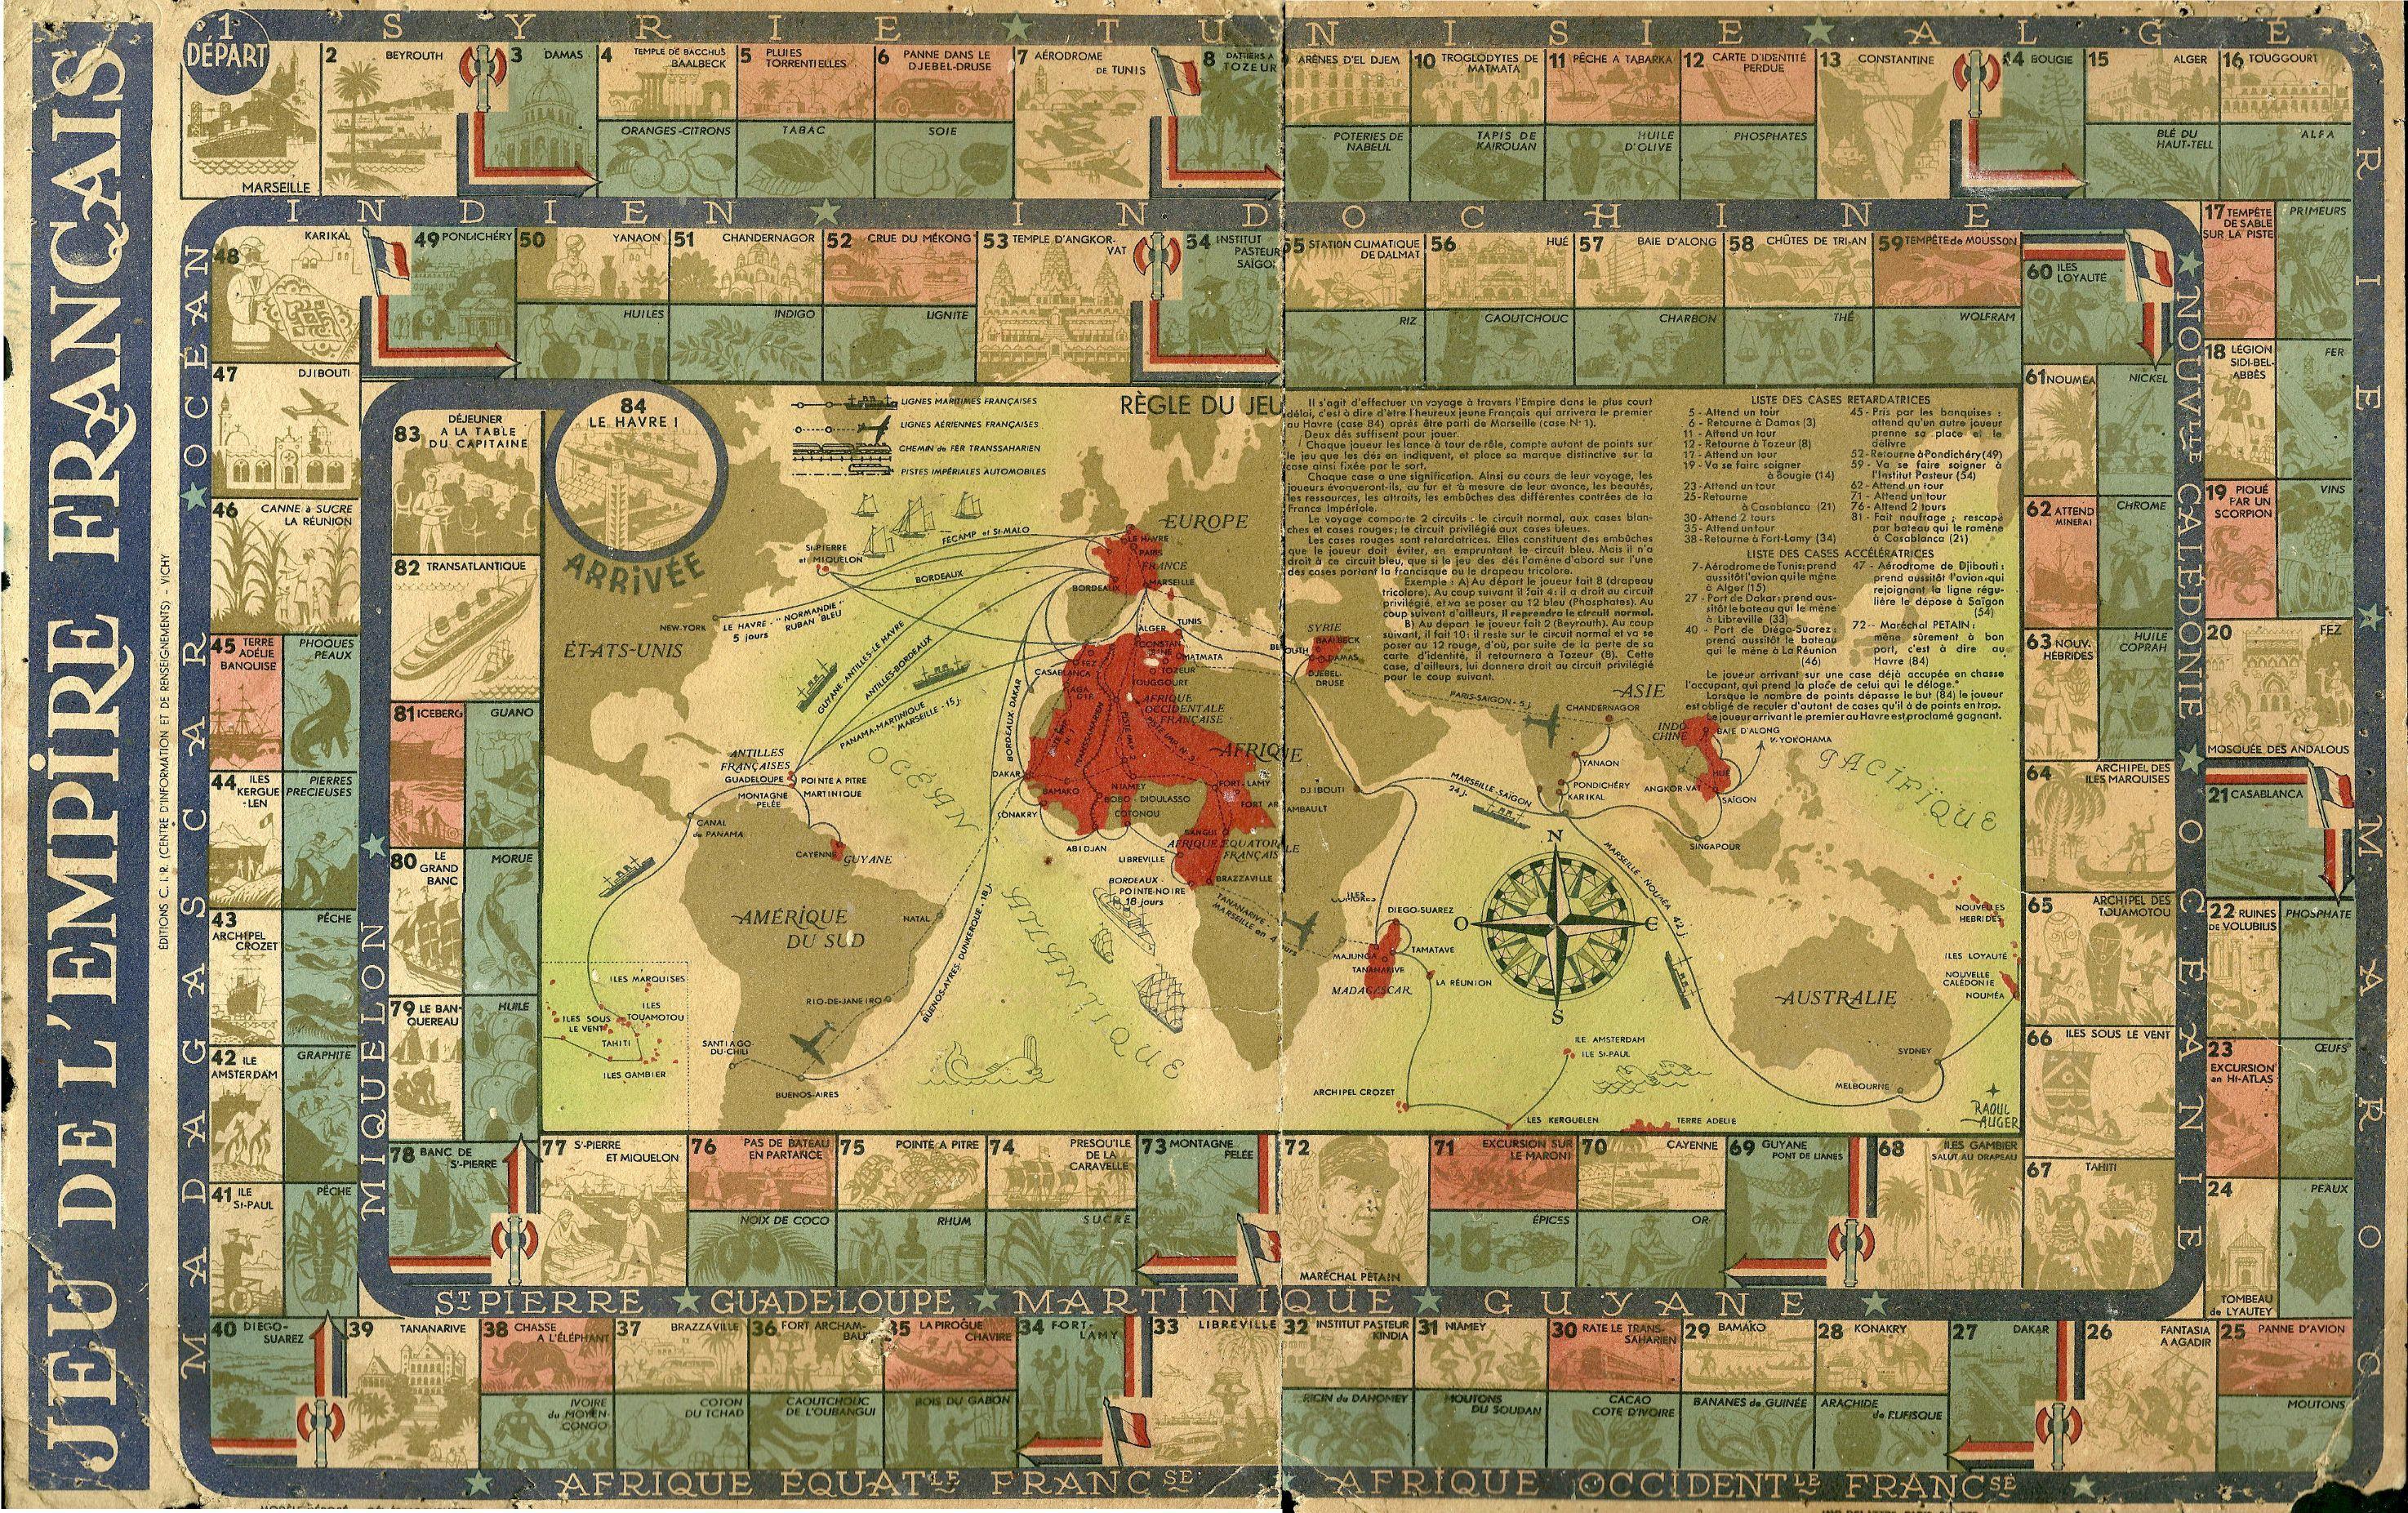 Jue de lempire franais game of the french empire ca 1940 jue de lempire franais game of the french empire ca 1940 gumiabroncs Images